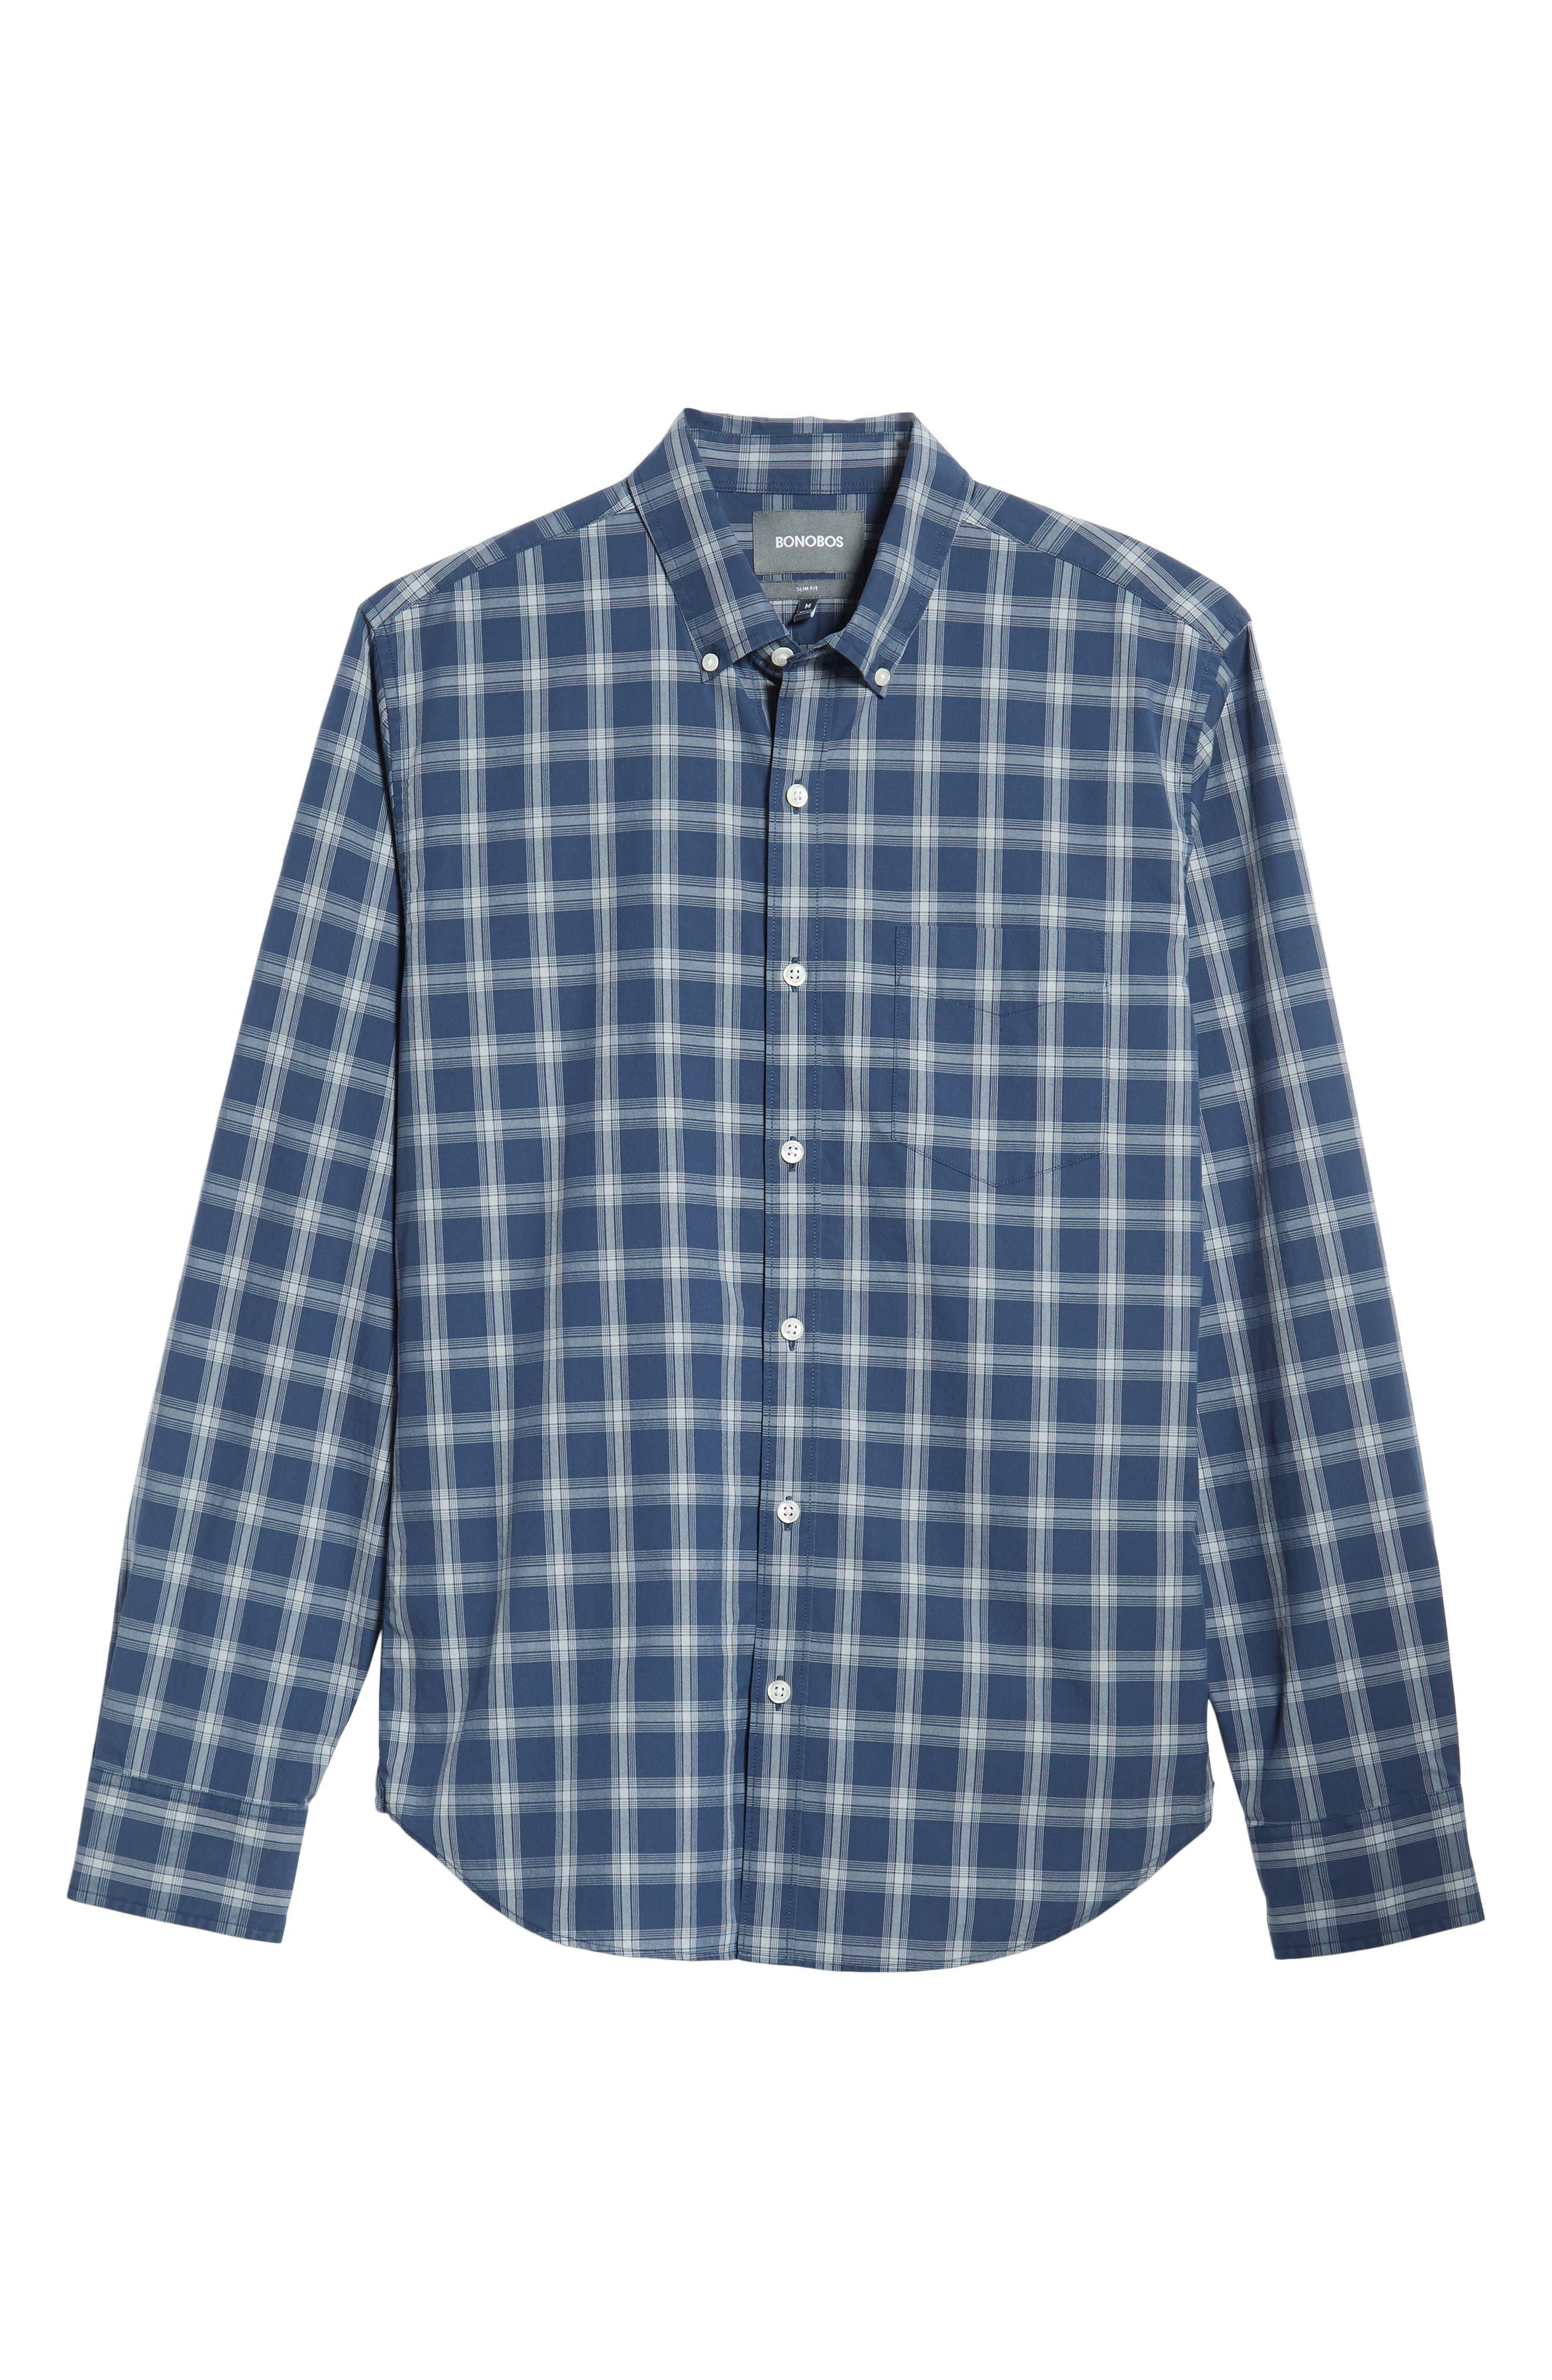 BONOBOS, Washed Button Down Slim Fit Plaid Sport Shirt, Alternate thumbnail 5, color, 400